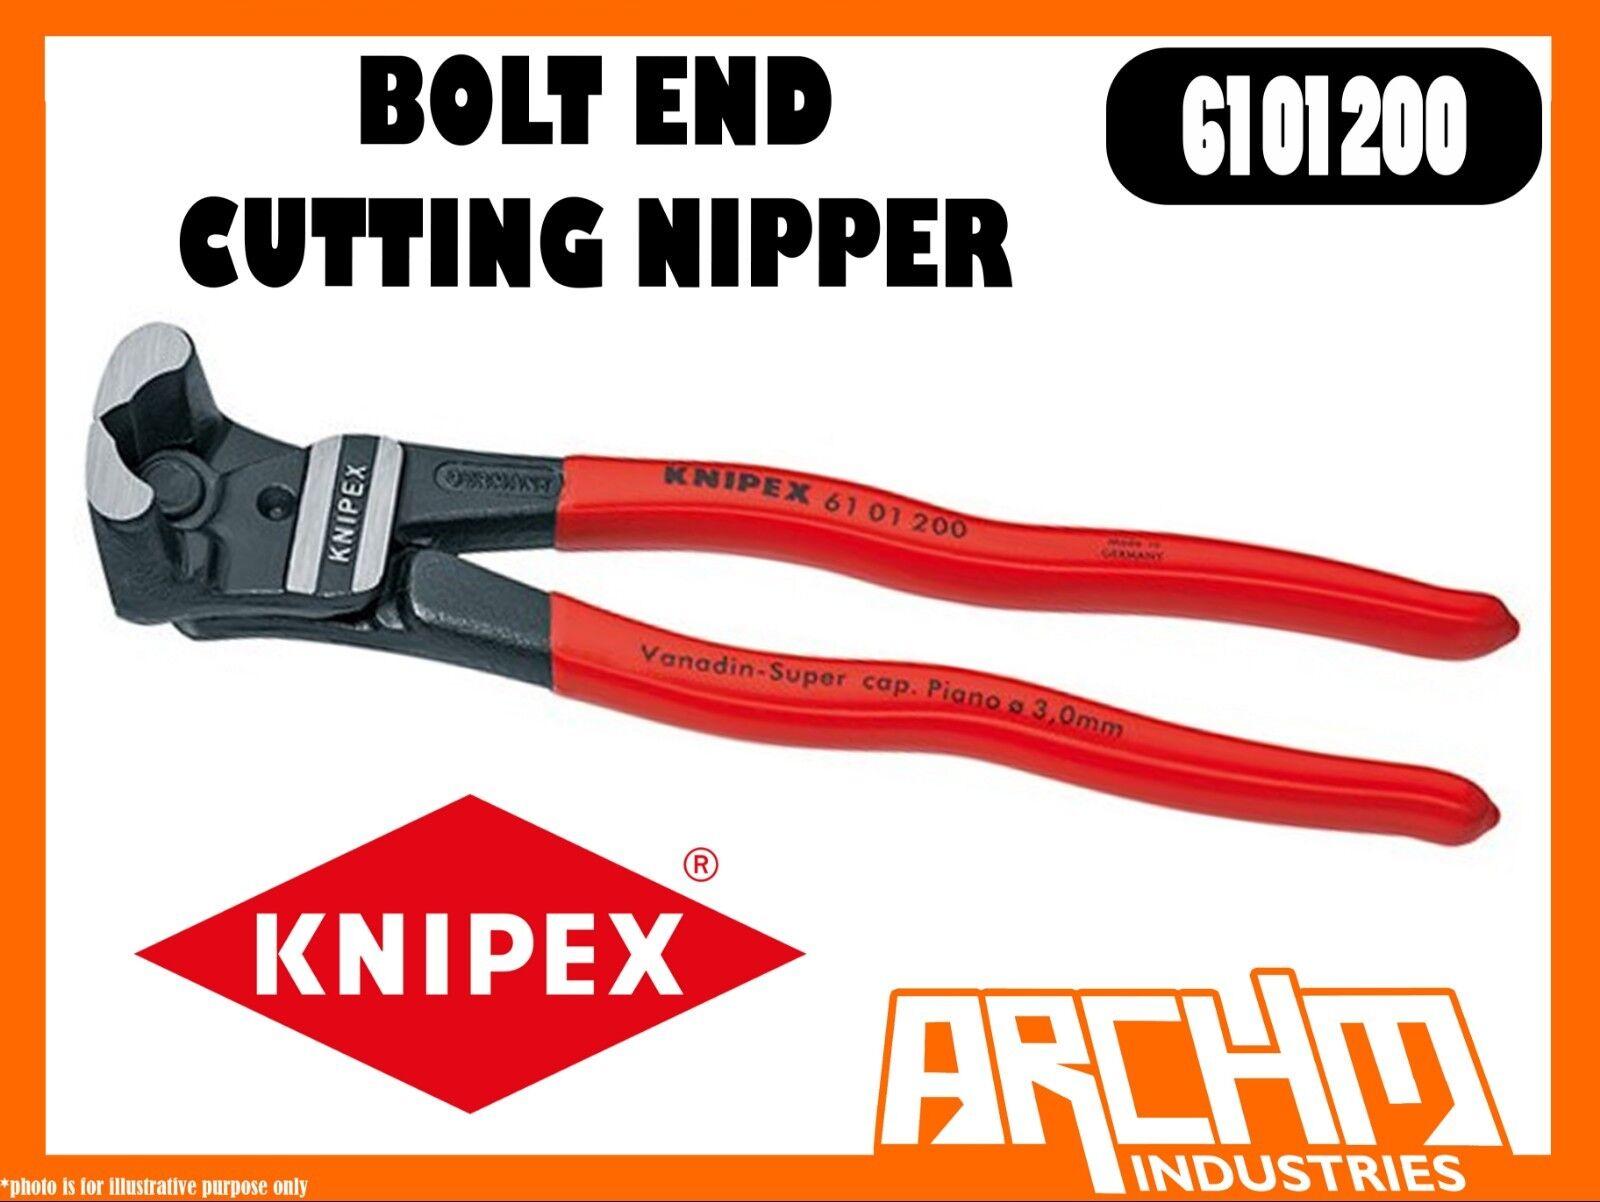 KNIPEX 6101200 - BOLT END CUTTING NIPPER - 200MM - CUTTING EDGES HARDENED